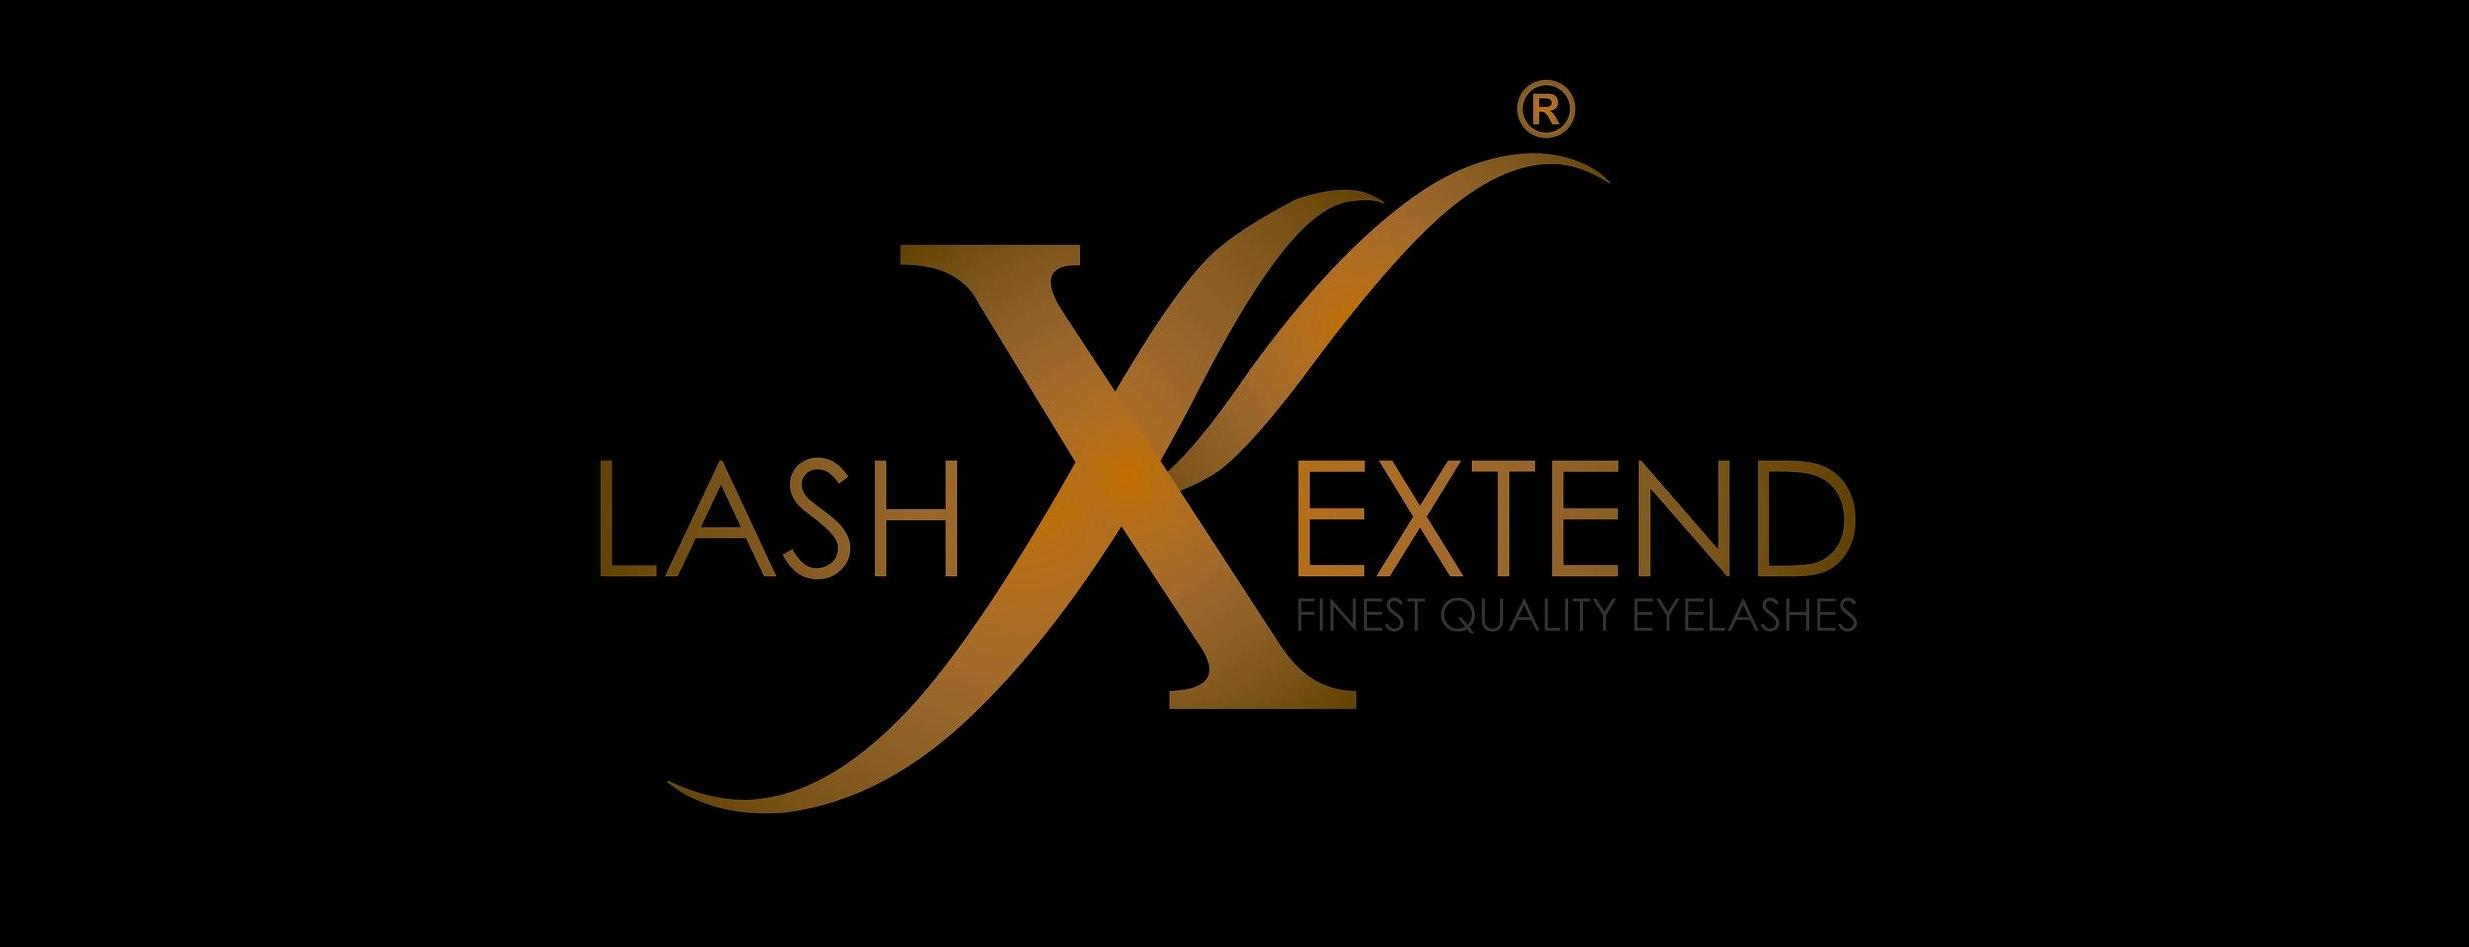 logo_zwart (1).jpg